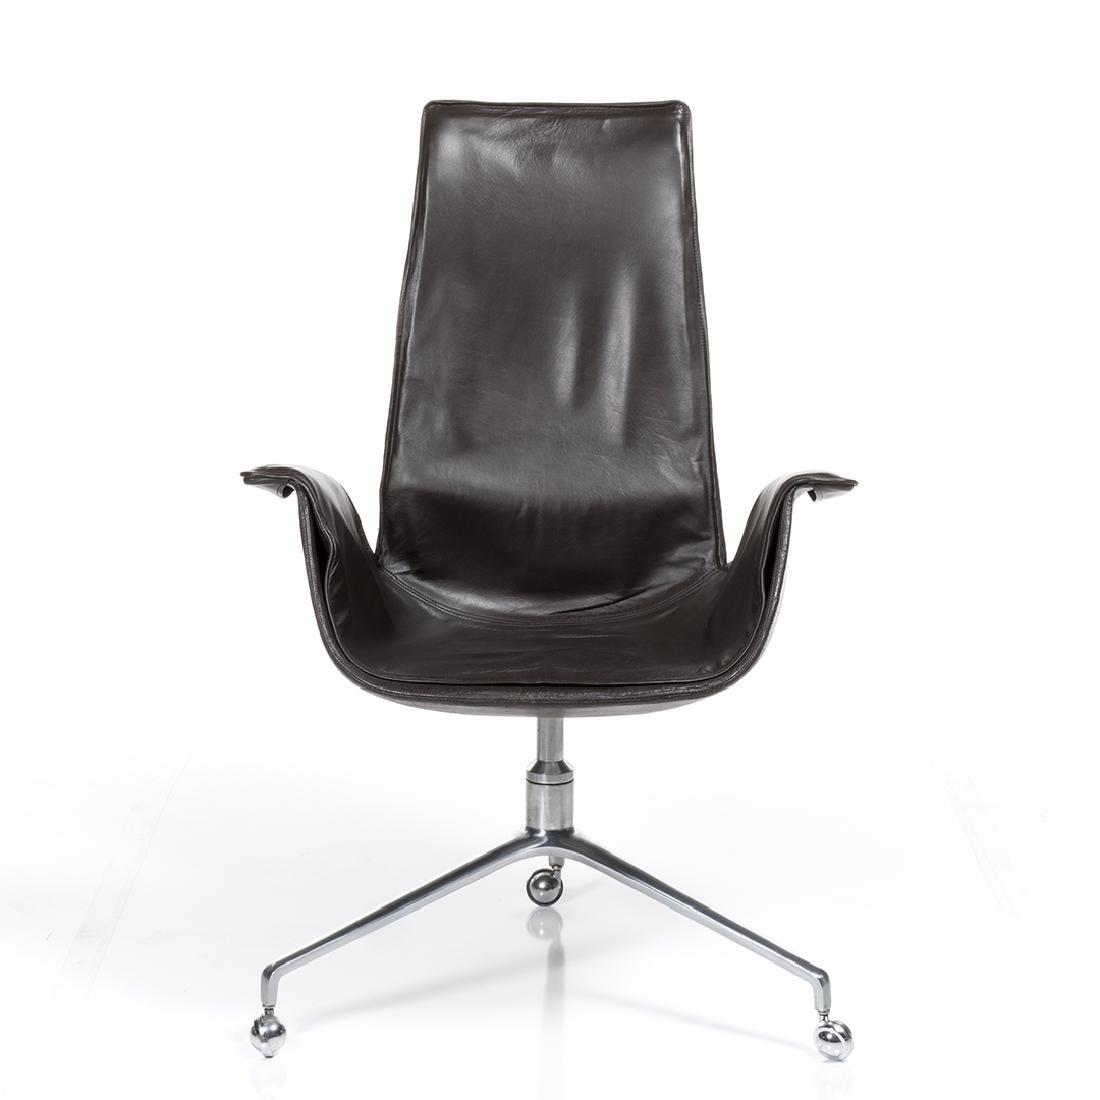 Preben Fabricius Tulip Chair - 2